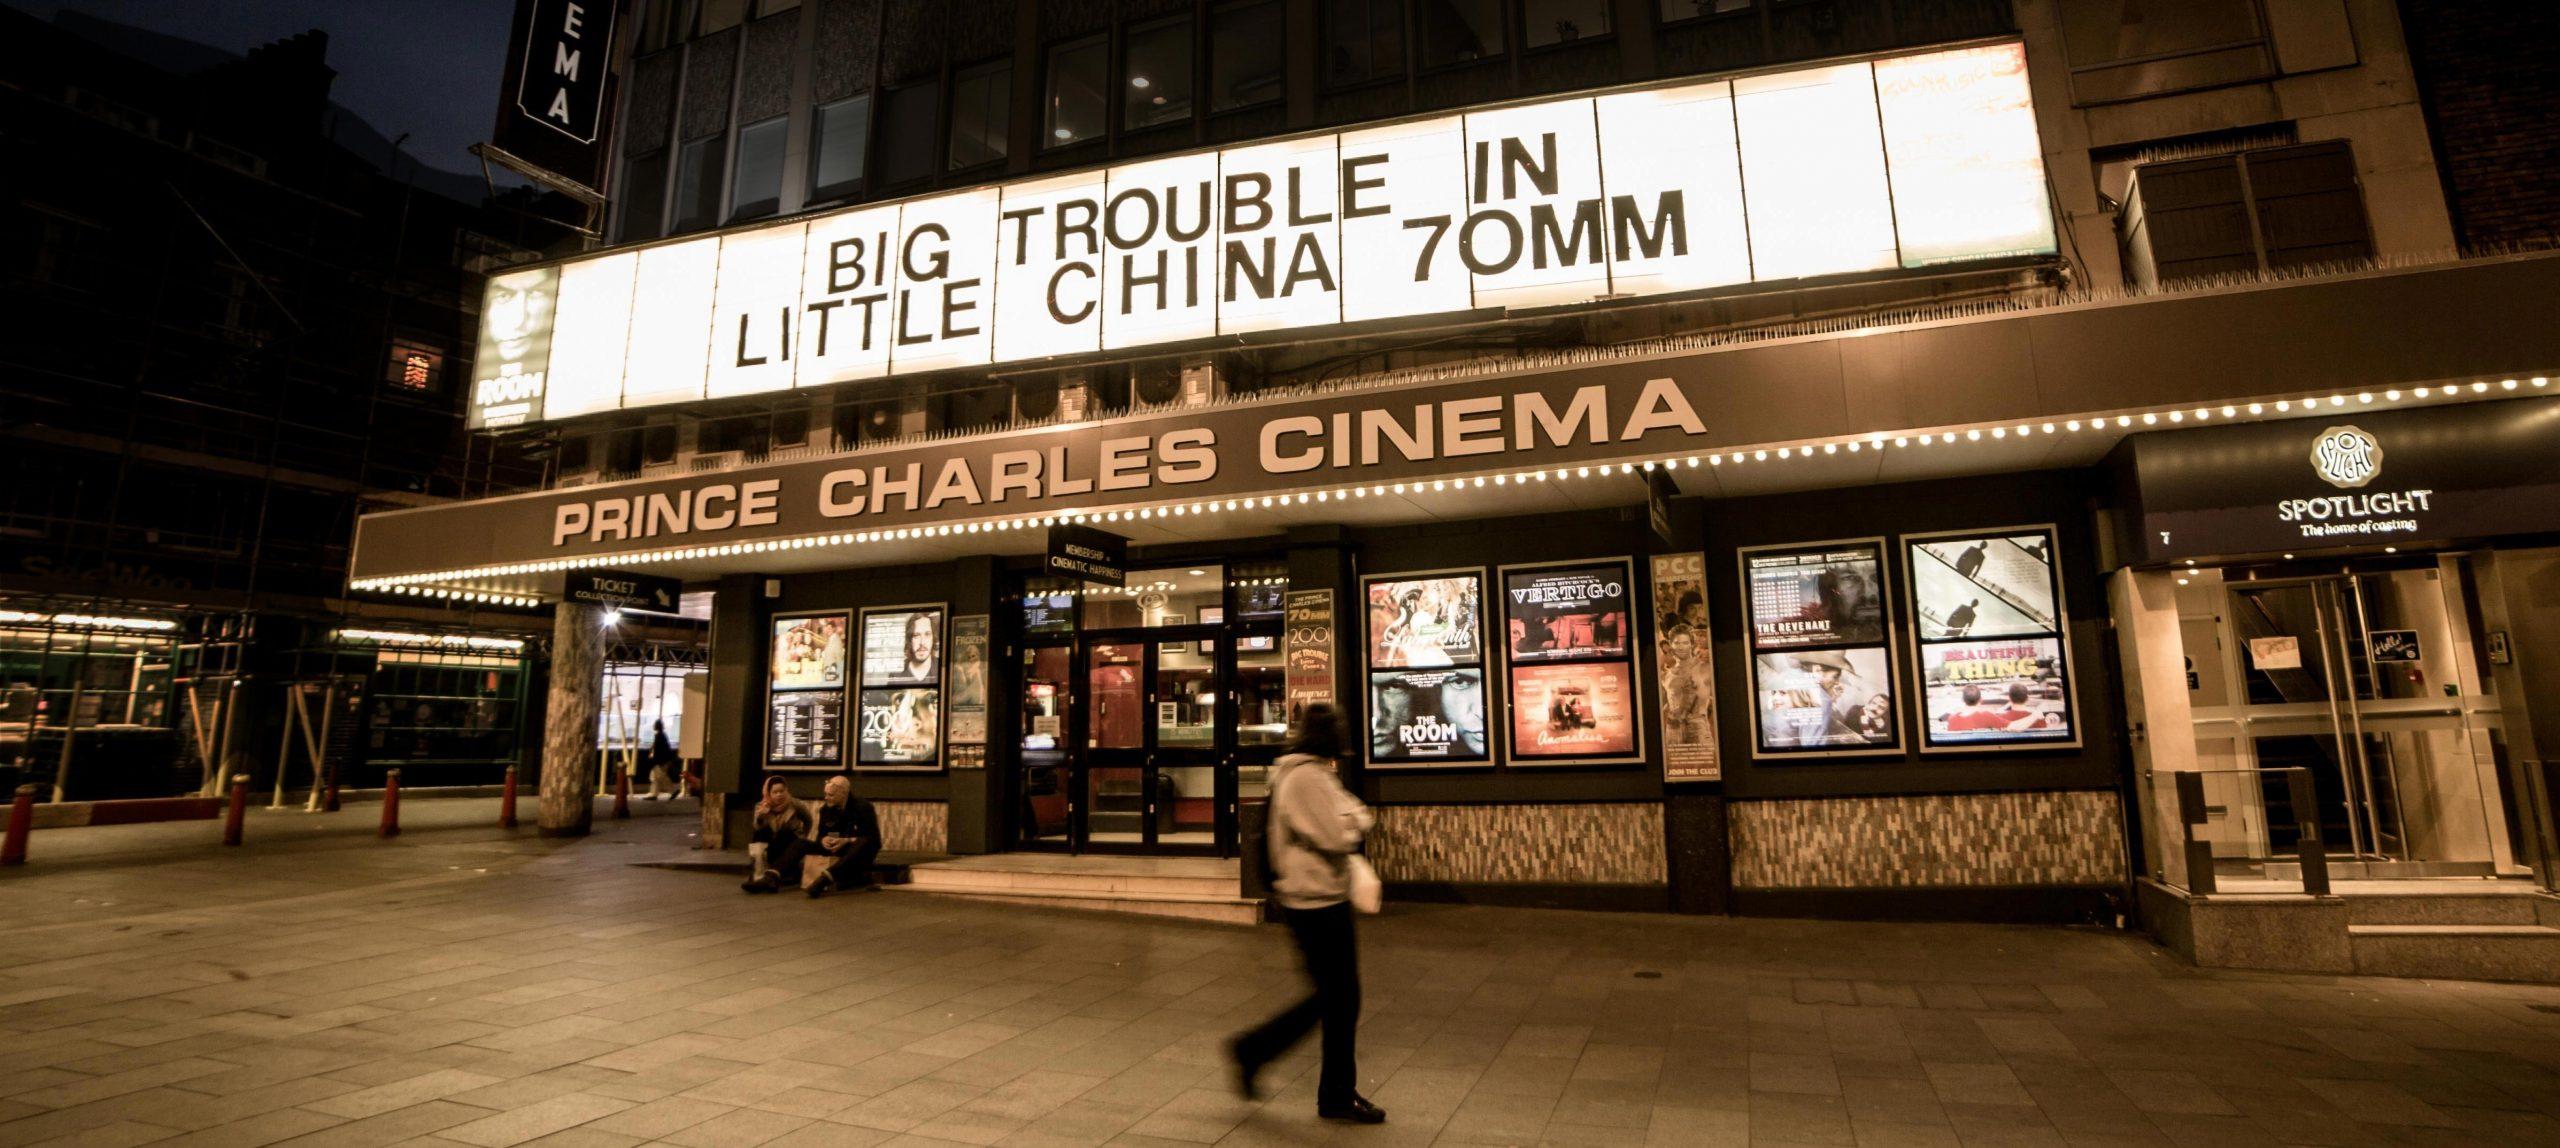 The Prince Charles Cinema